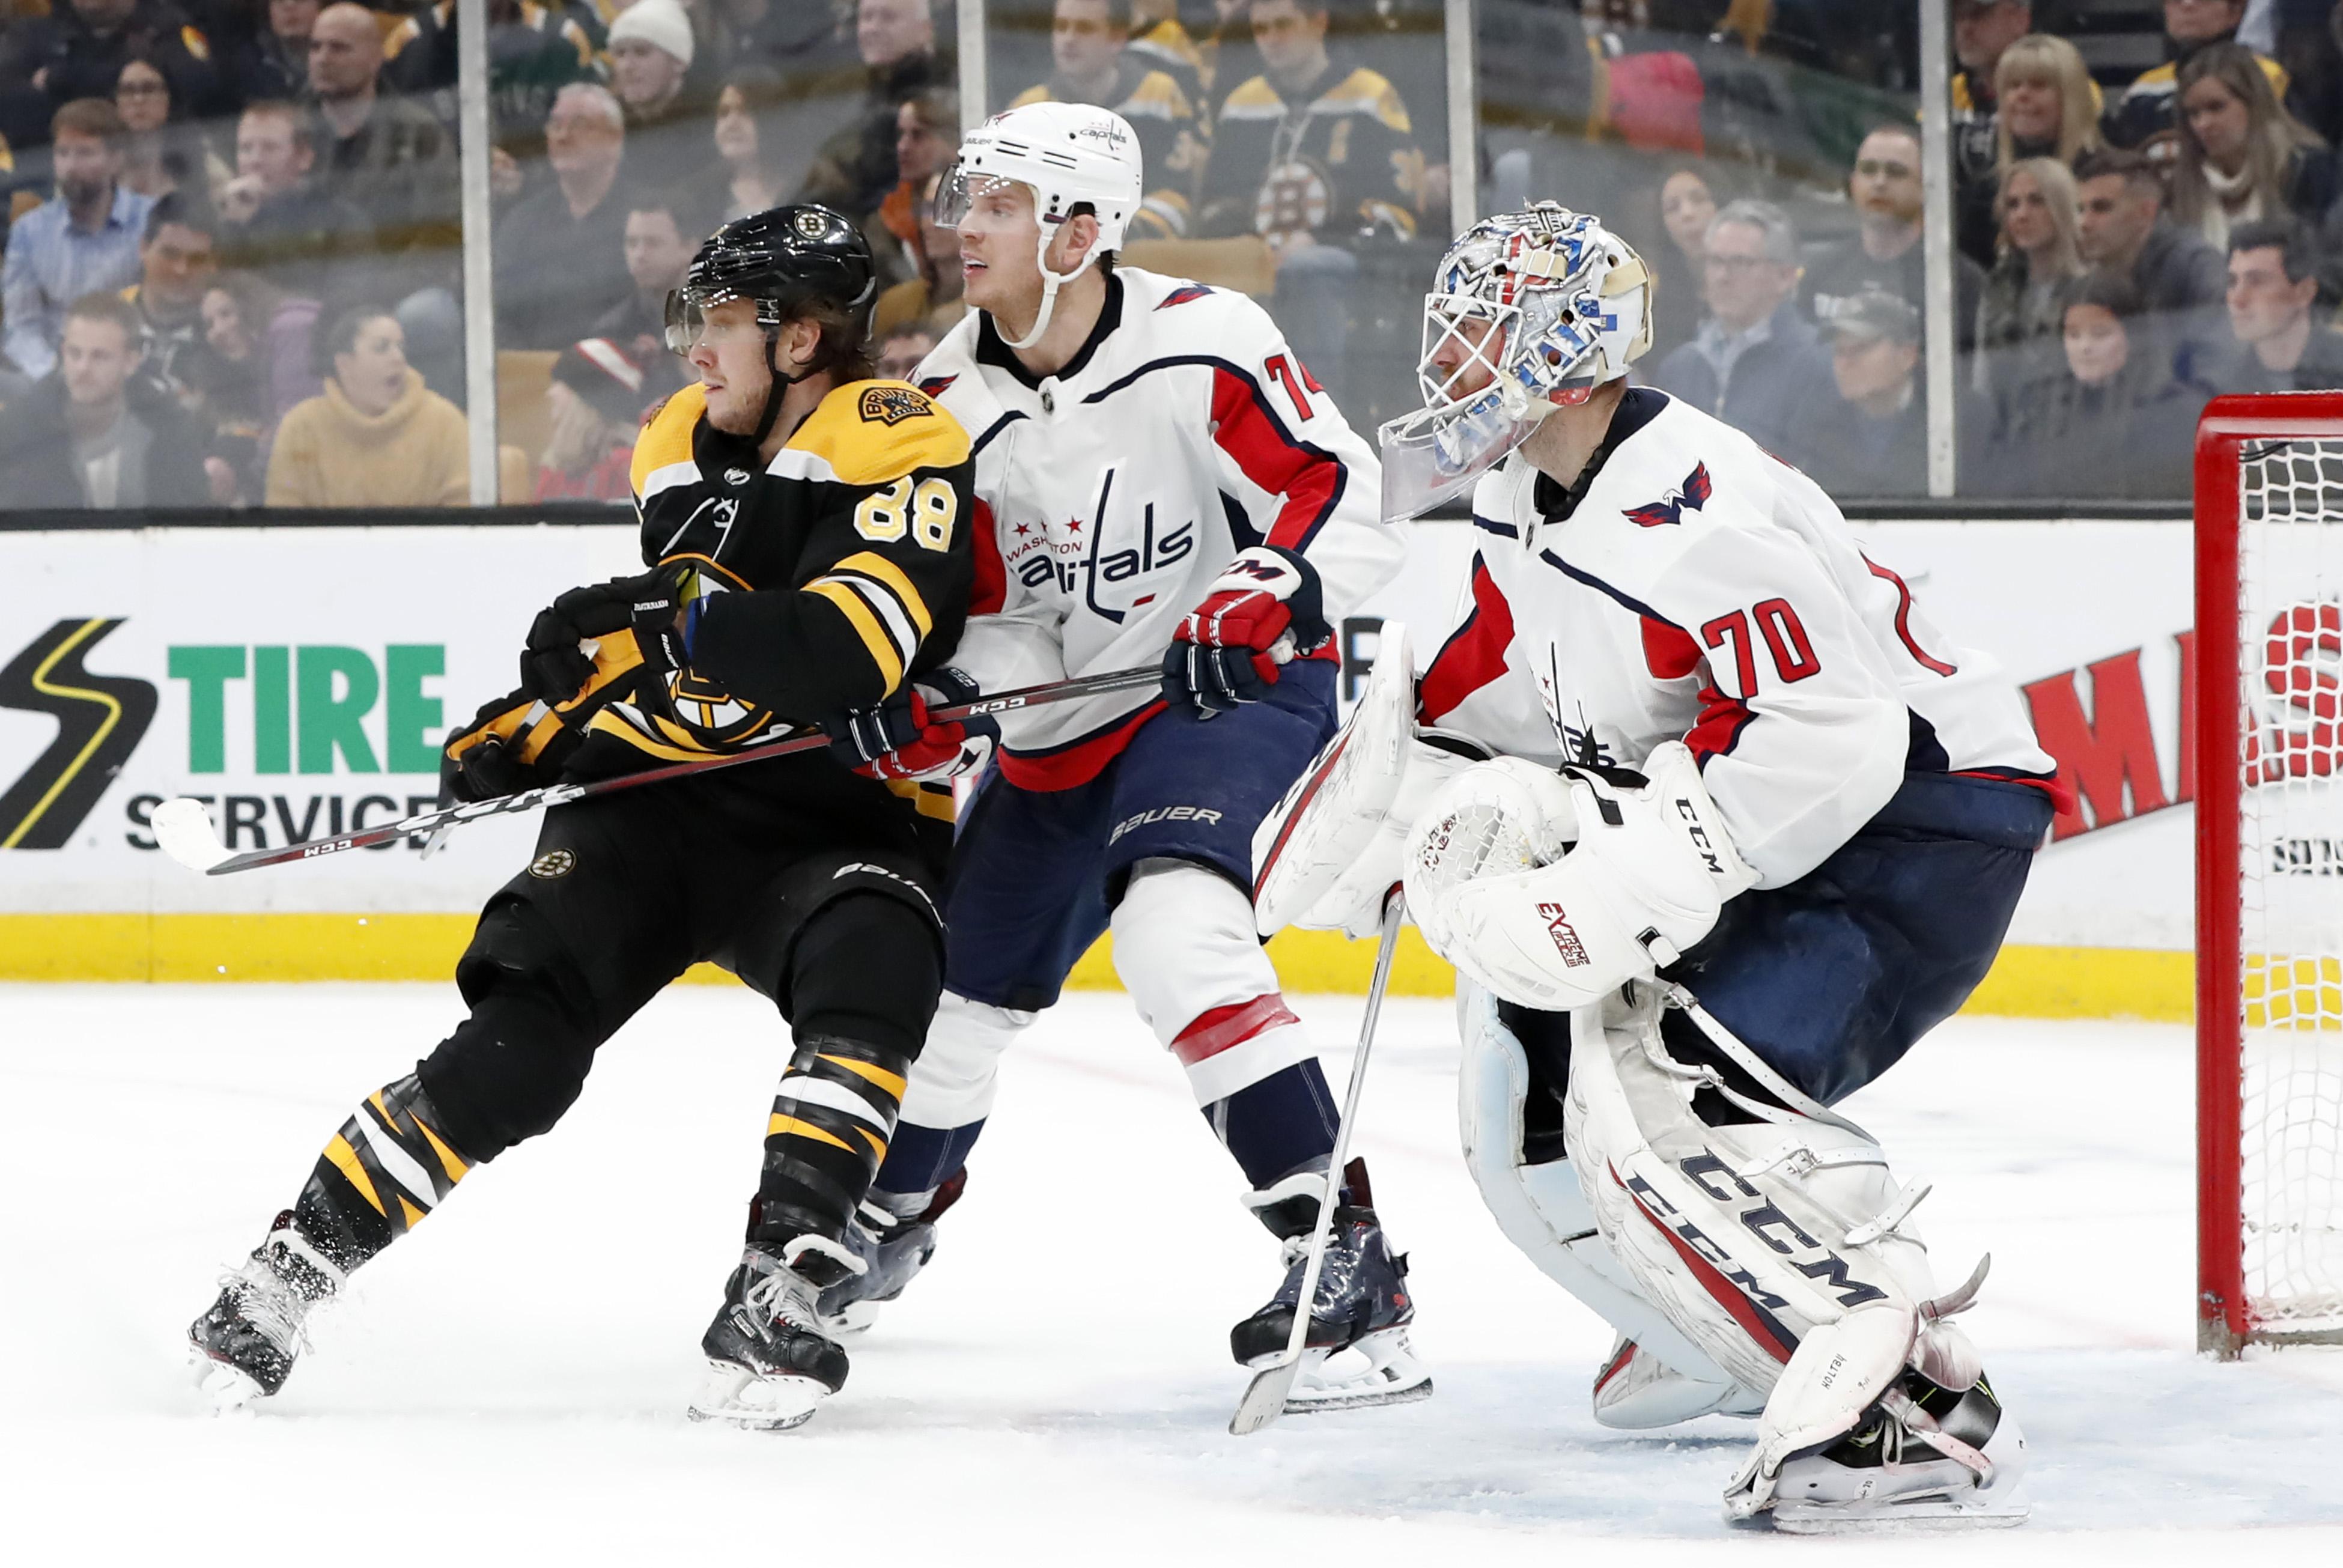 NHL: JAN 10 Capitals at Bruins